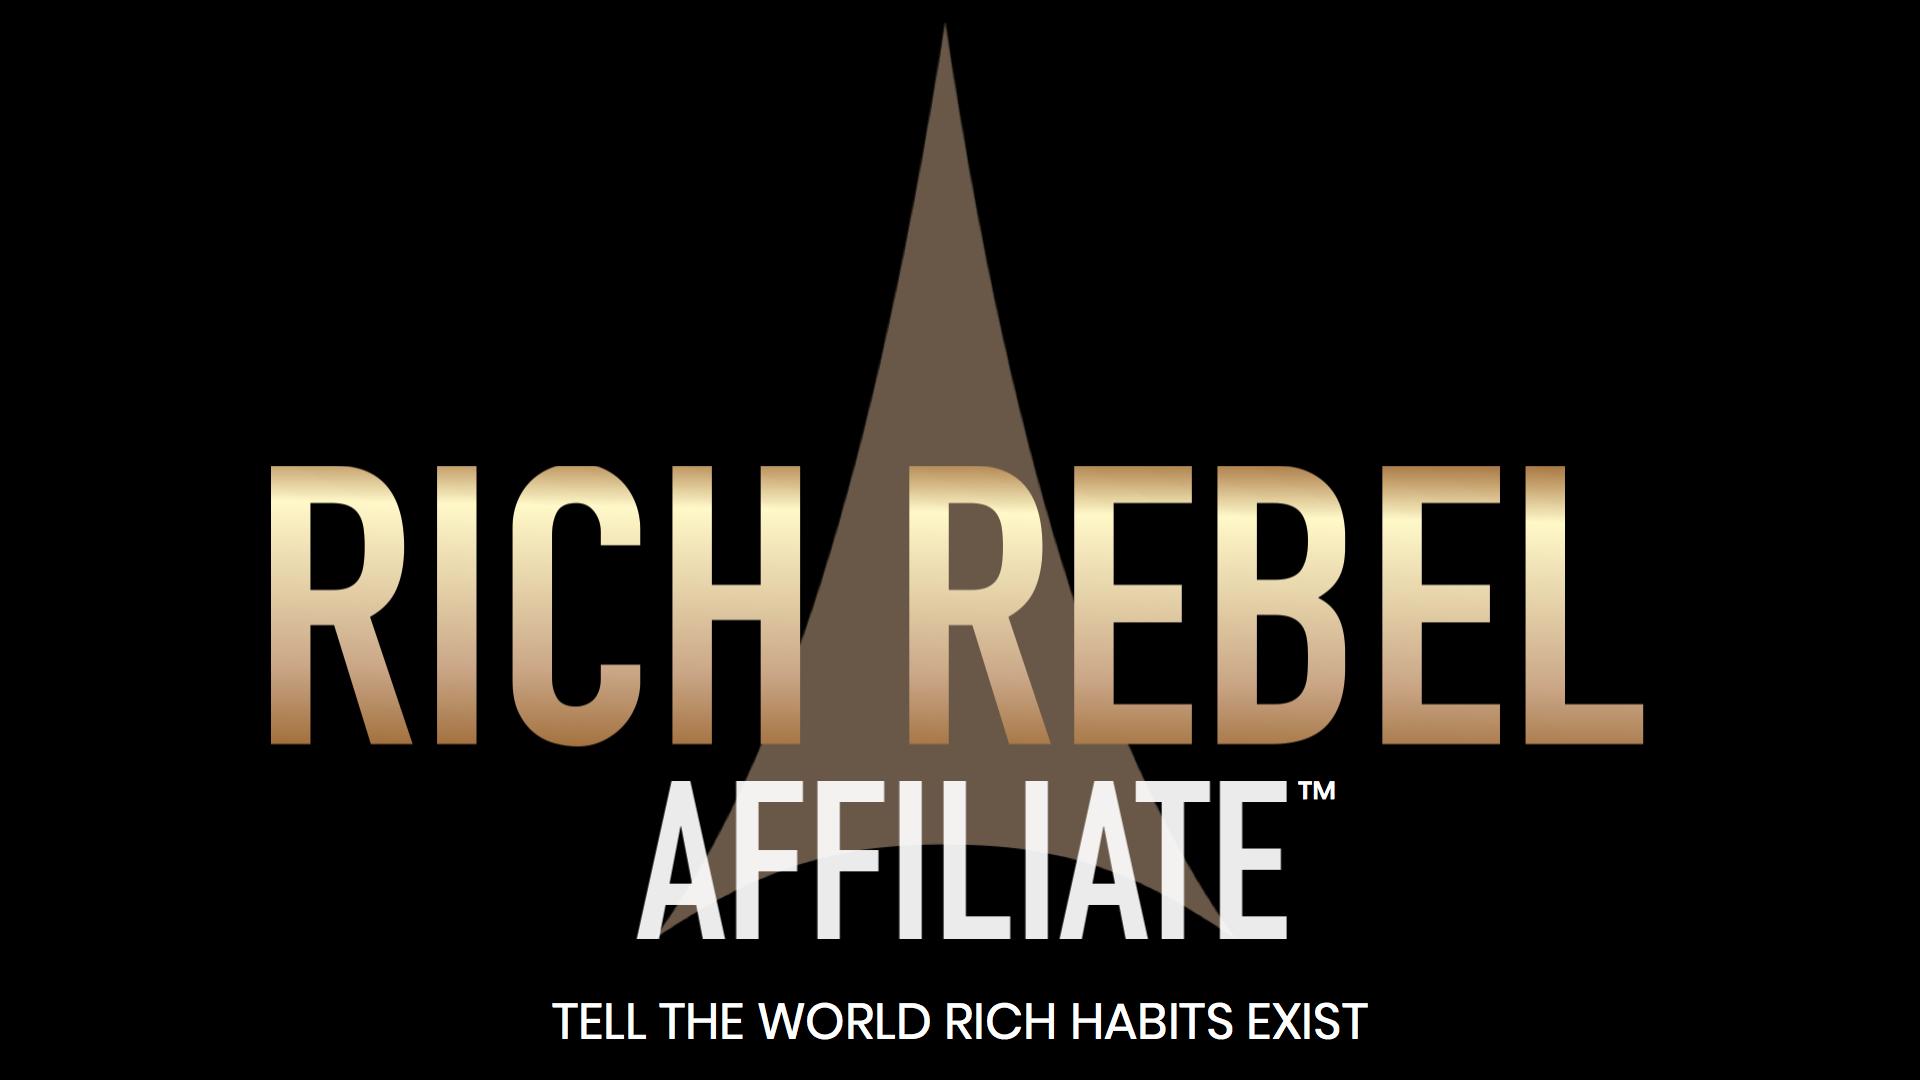 RICH REBEL AFFILIATE Logo.png